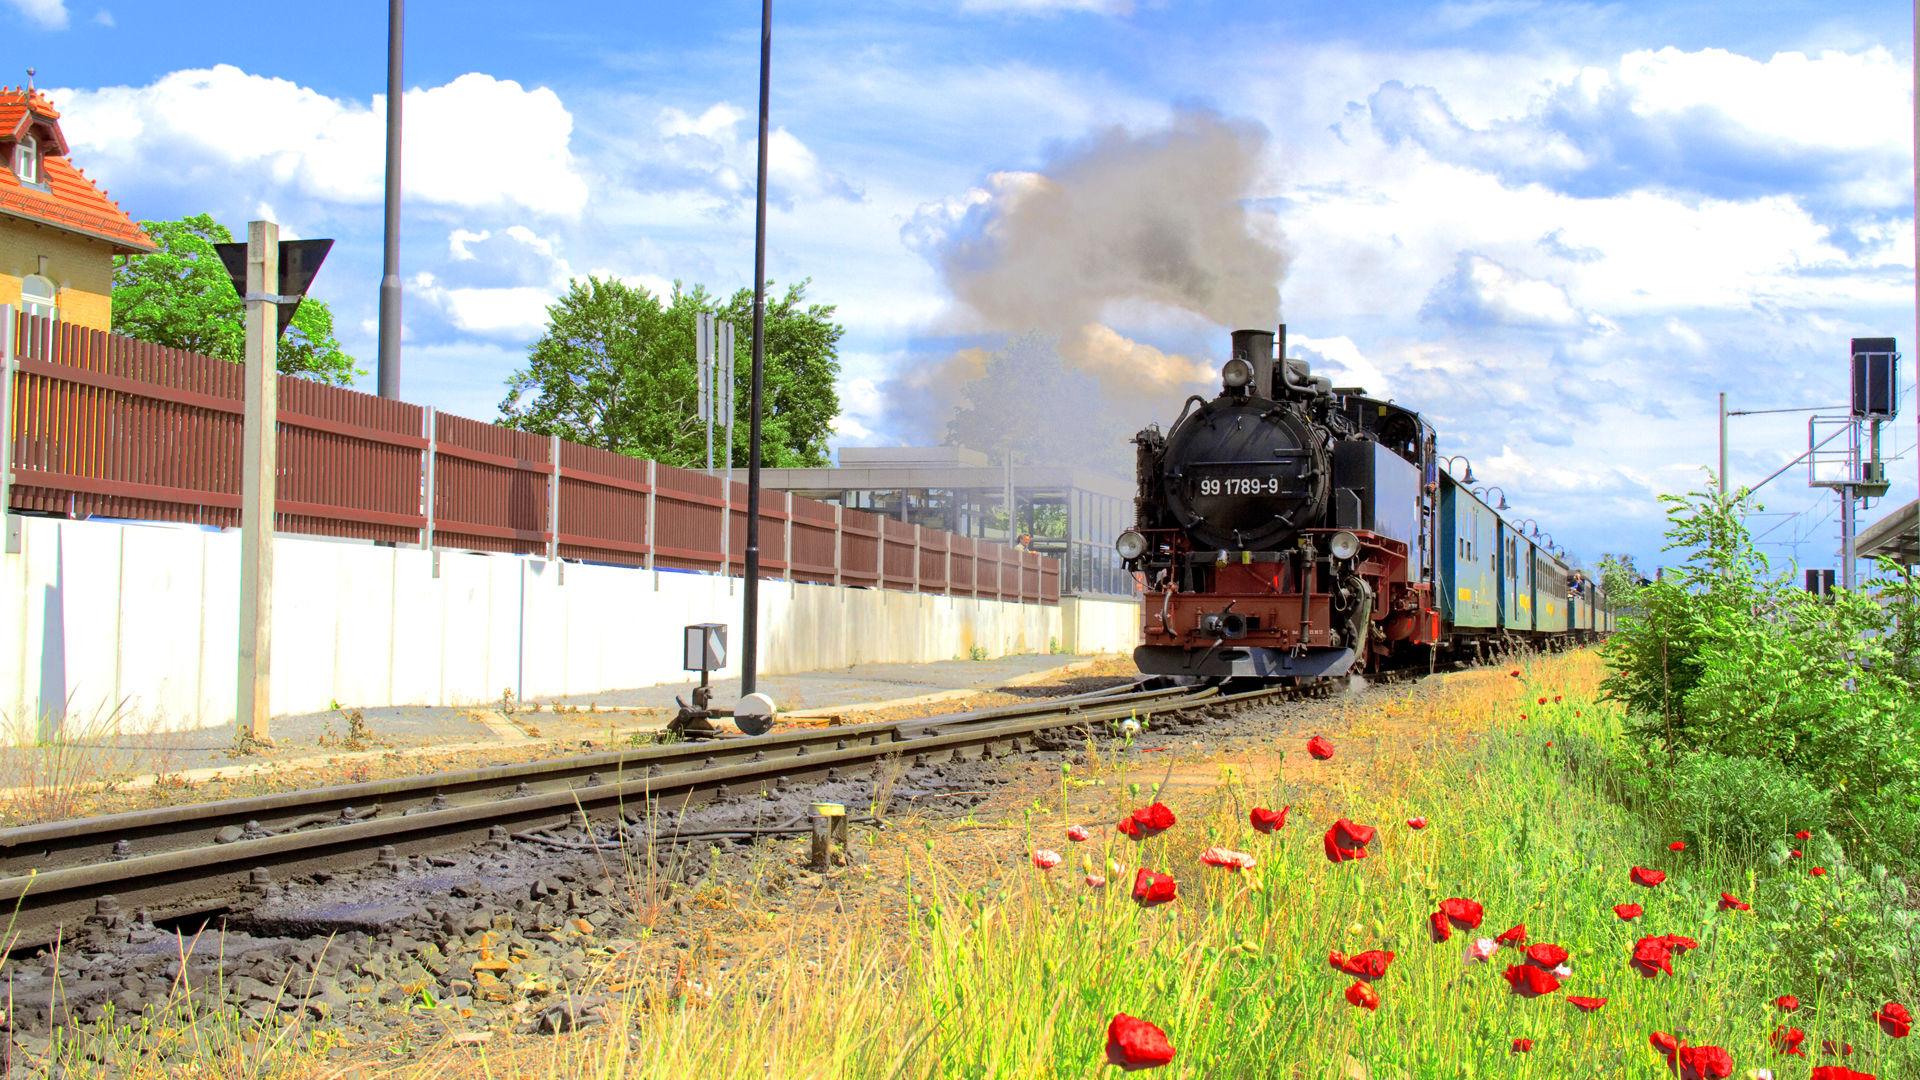 Steam Karte 20.Lößnitzgrundbahn Sdg Mbh Railway Company Dresden Elbe Region